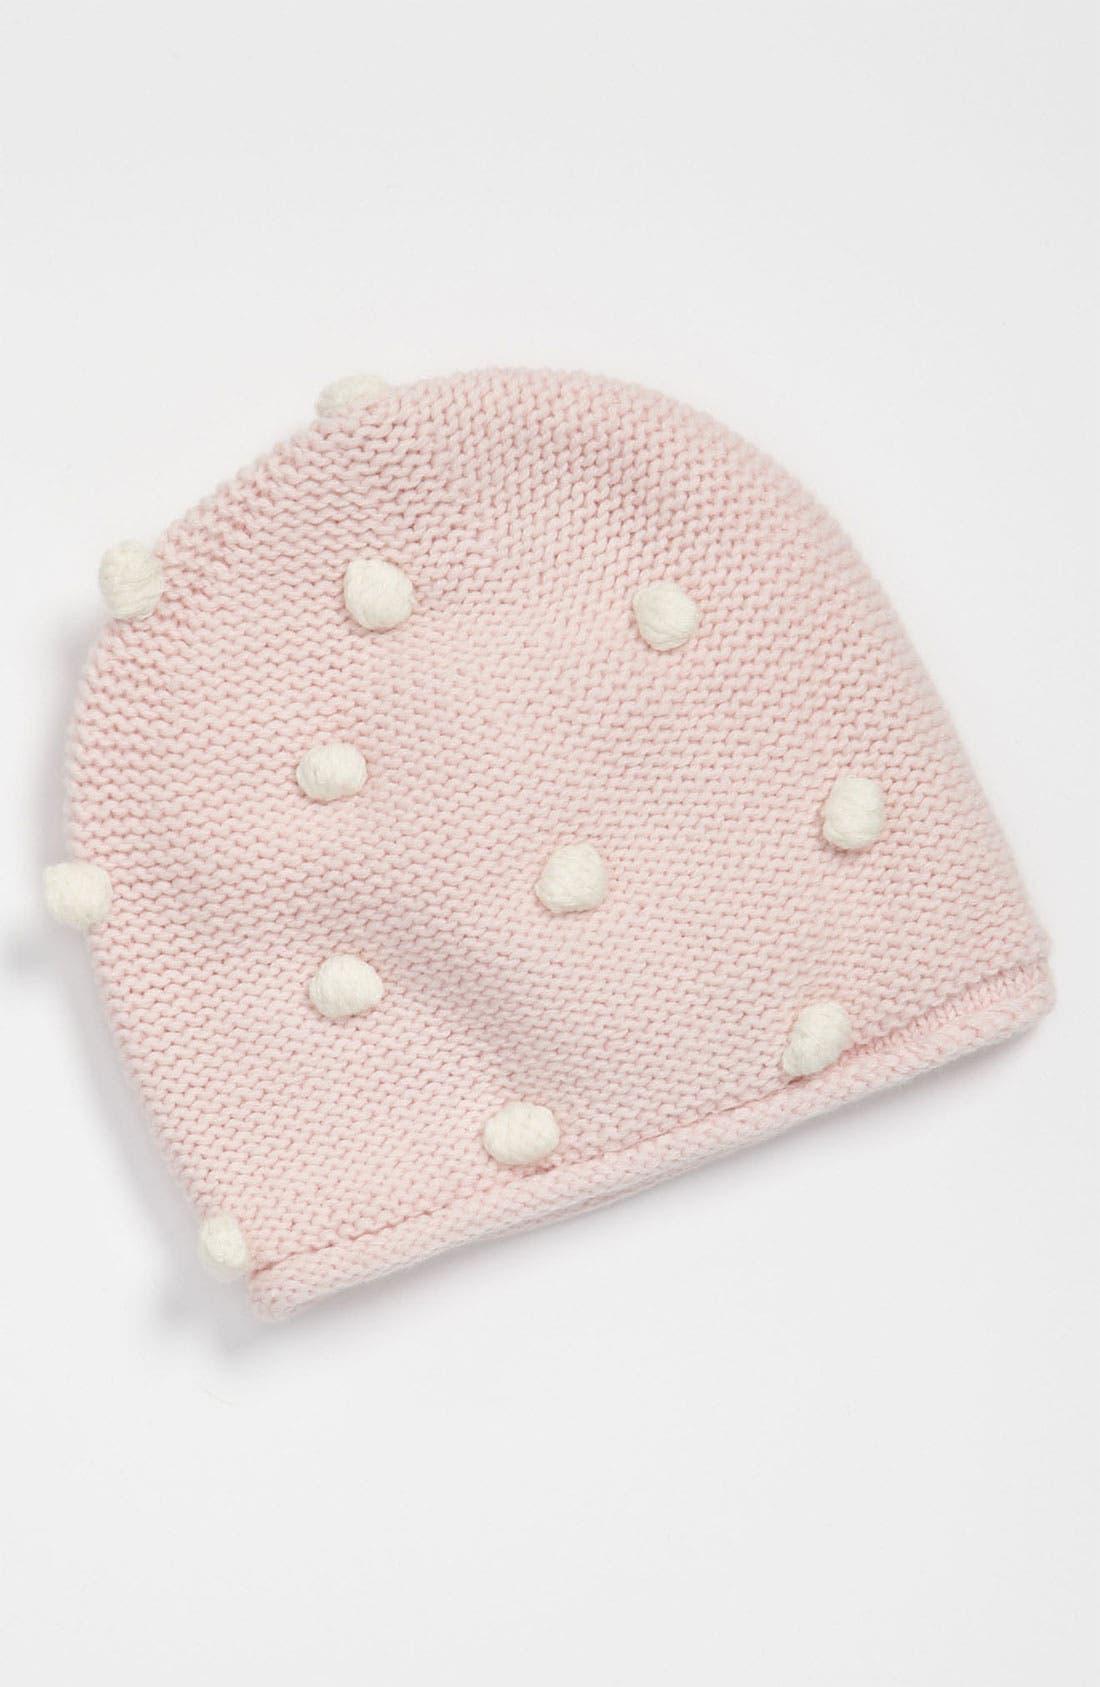 Alternate Image 1 Selected - United Colors of Benetton Kids Pompom Hat (Infant)